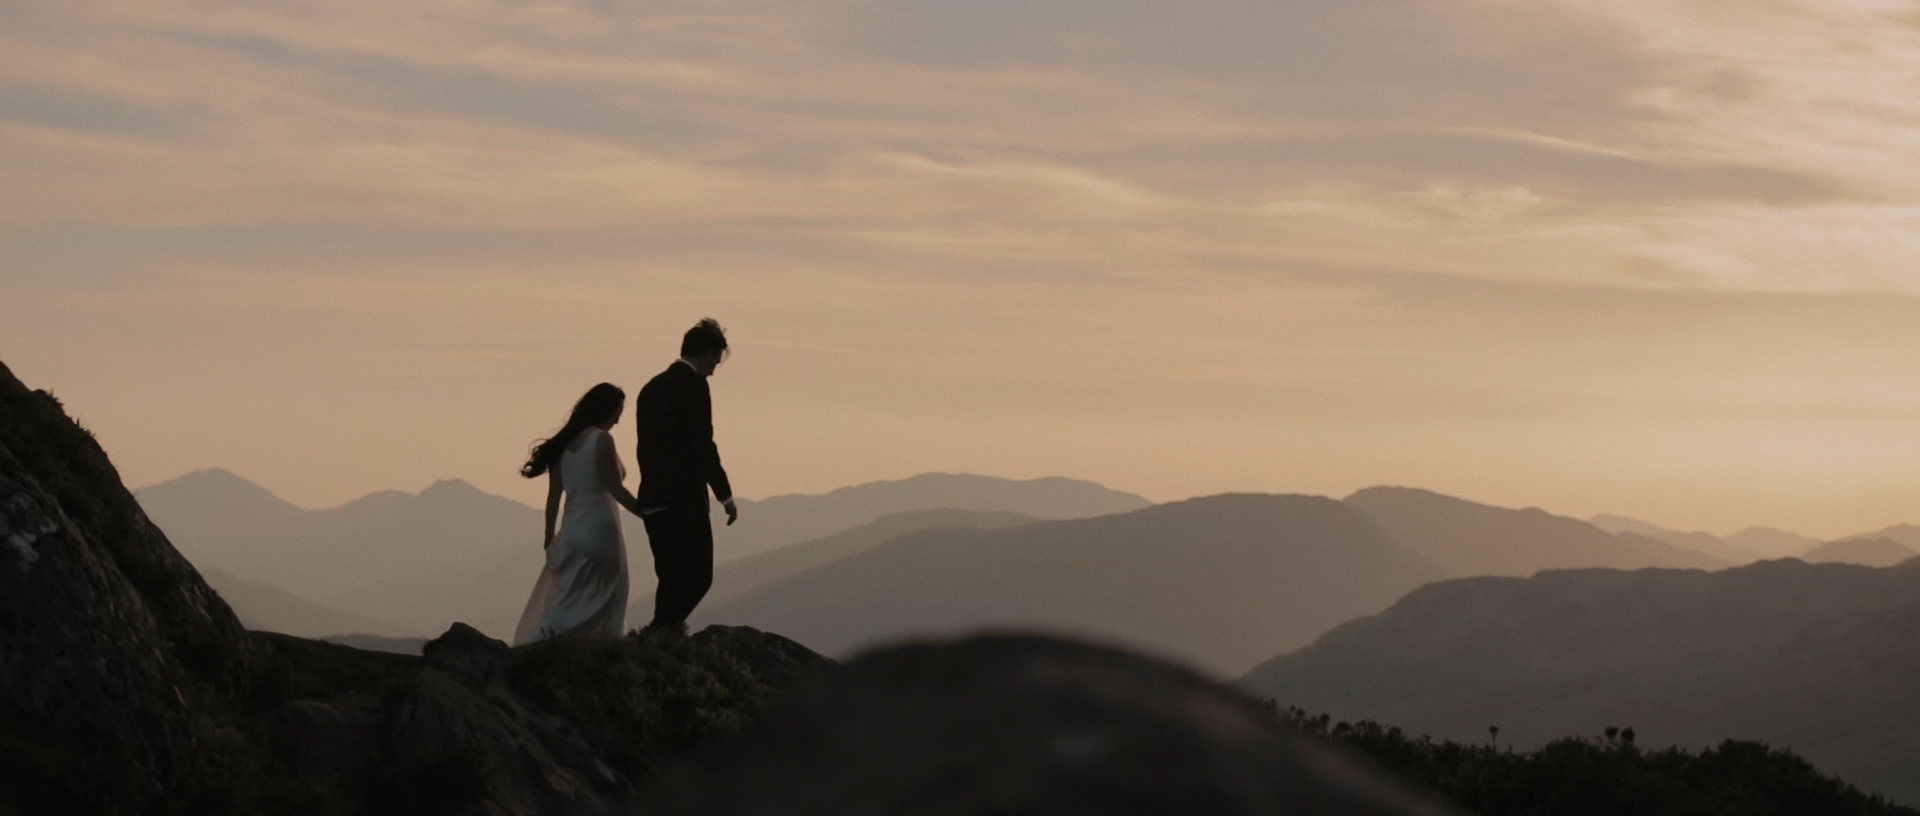 comrie-croft-wedding-videographer_LL_01.jpg